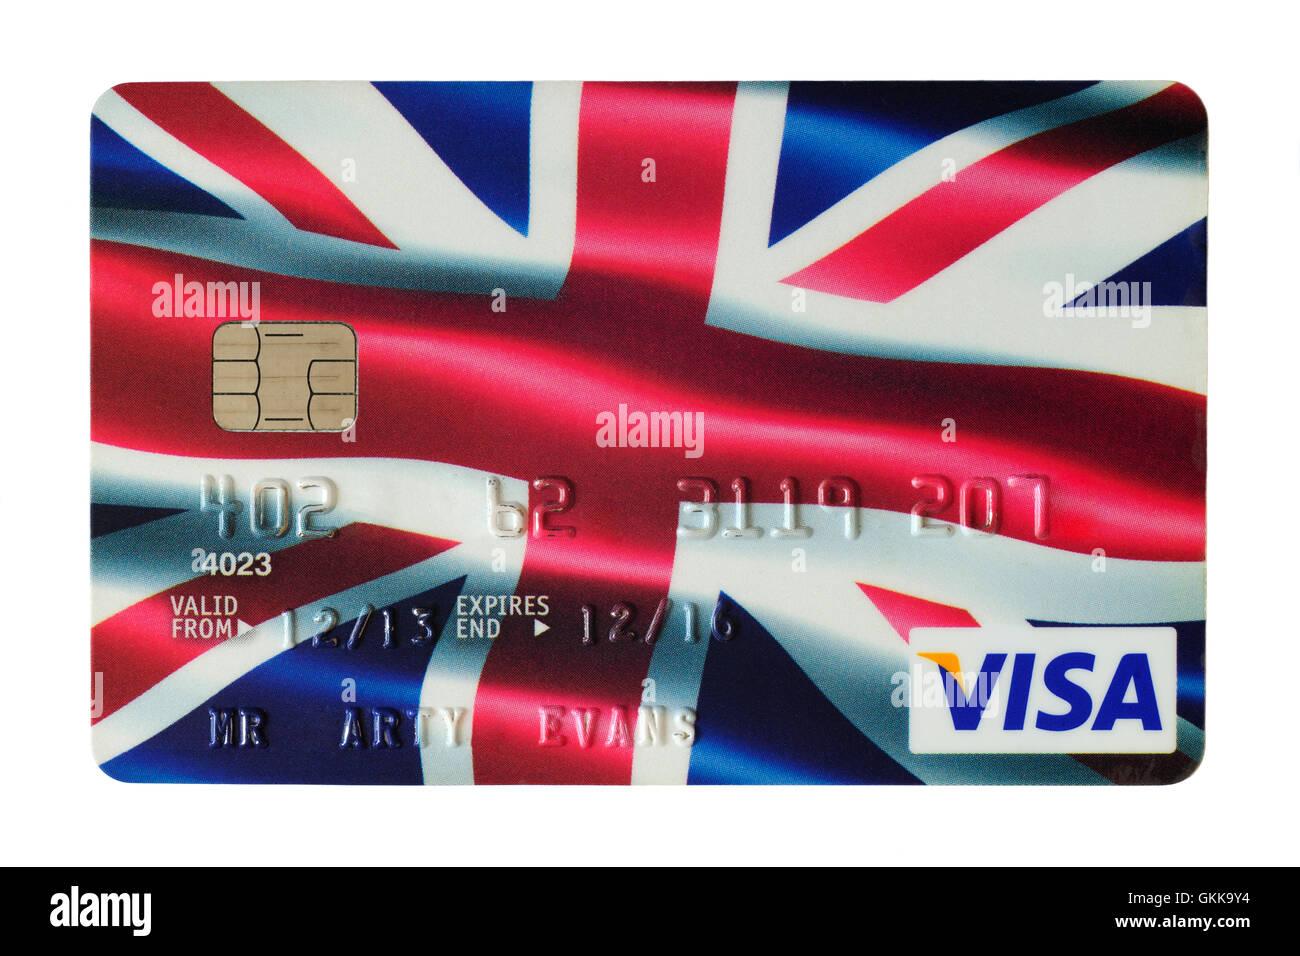 Carte Visa Angleterre.Carte De Credit Visa Avec L Union Devant L Angleterre Uk